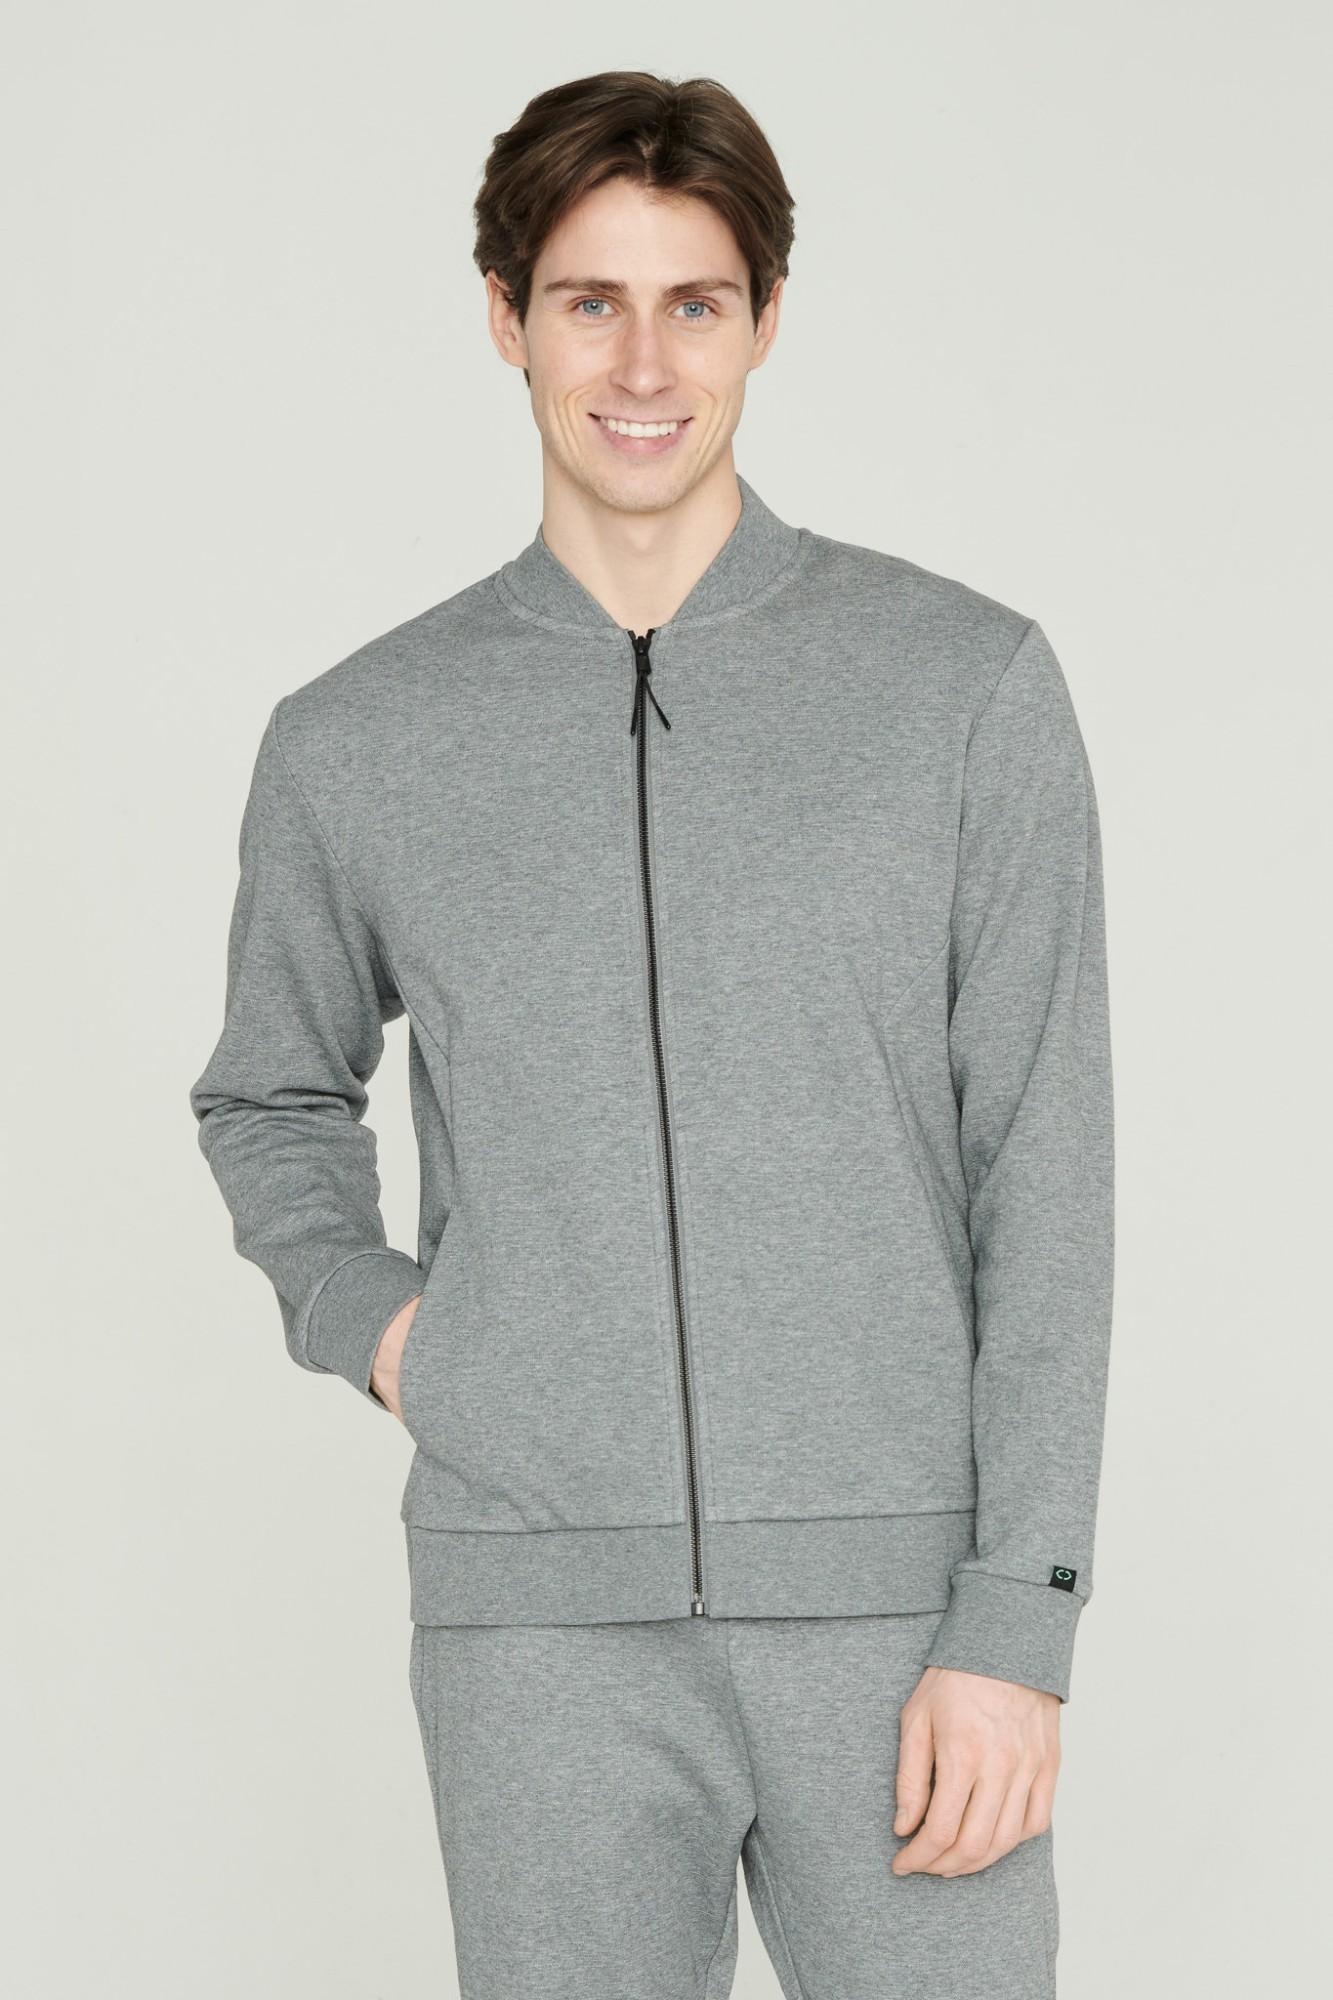 AUDIMAS Atsegamas medvilninis džemperis 2111-461 Pewter Melange M